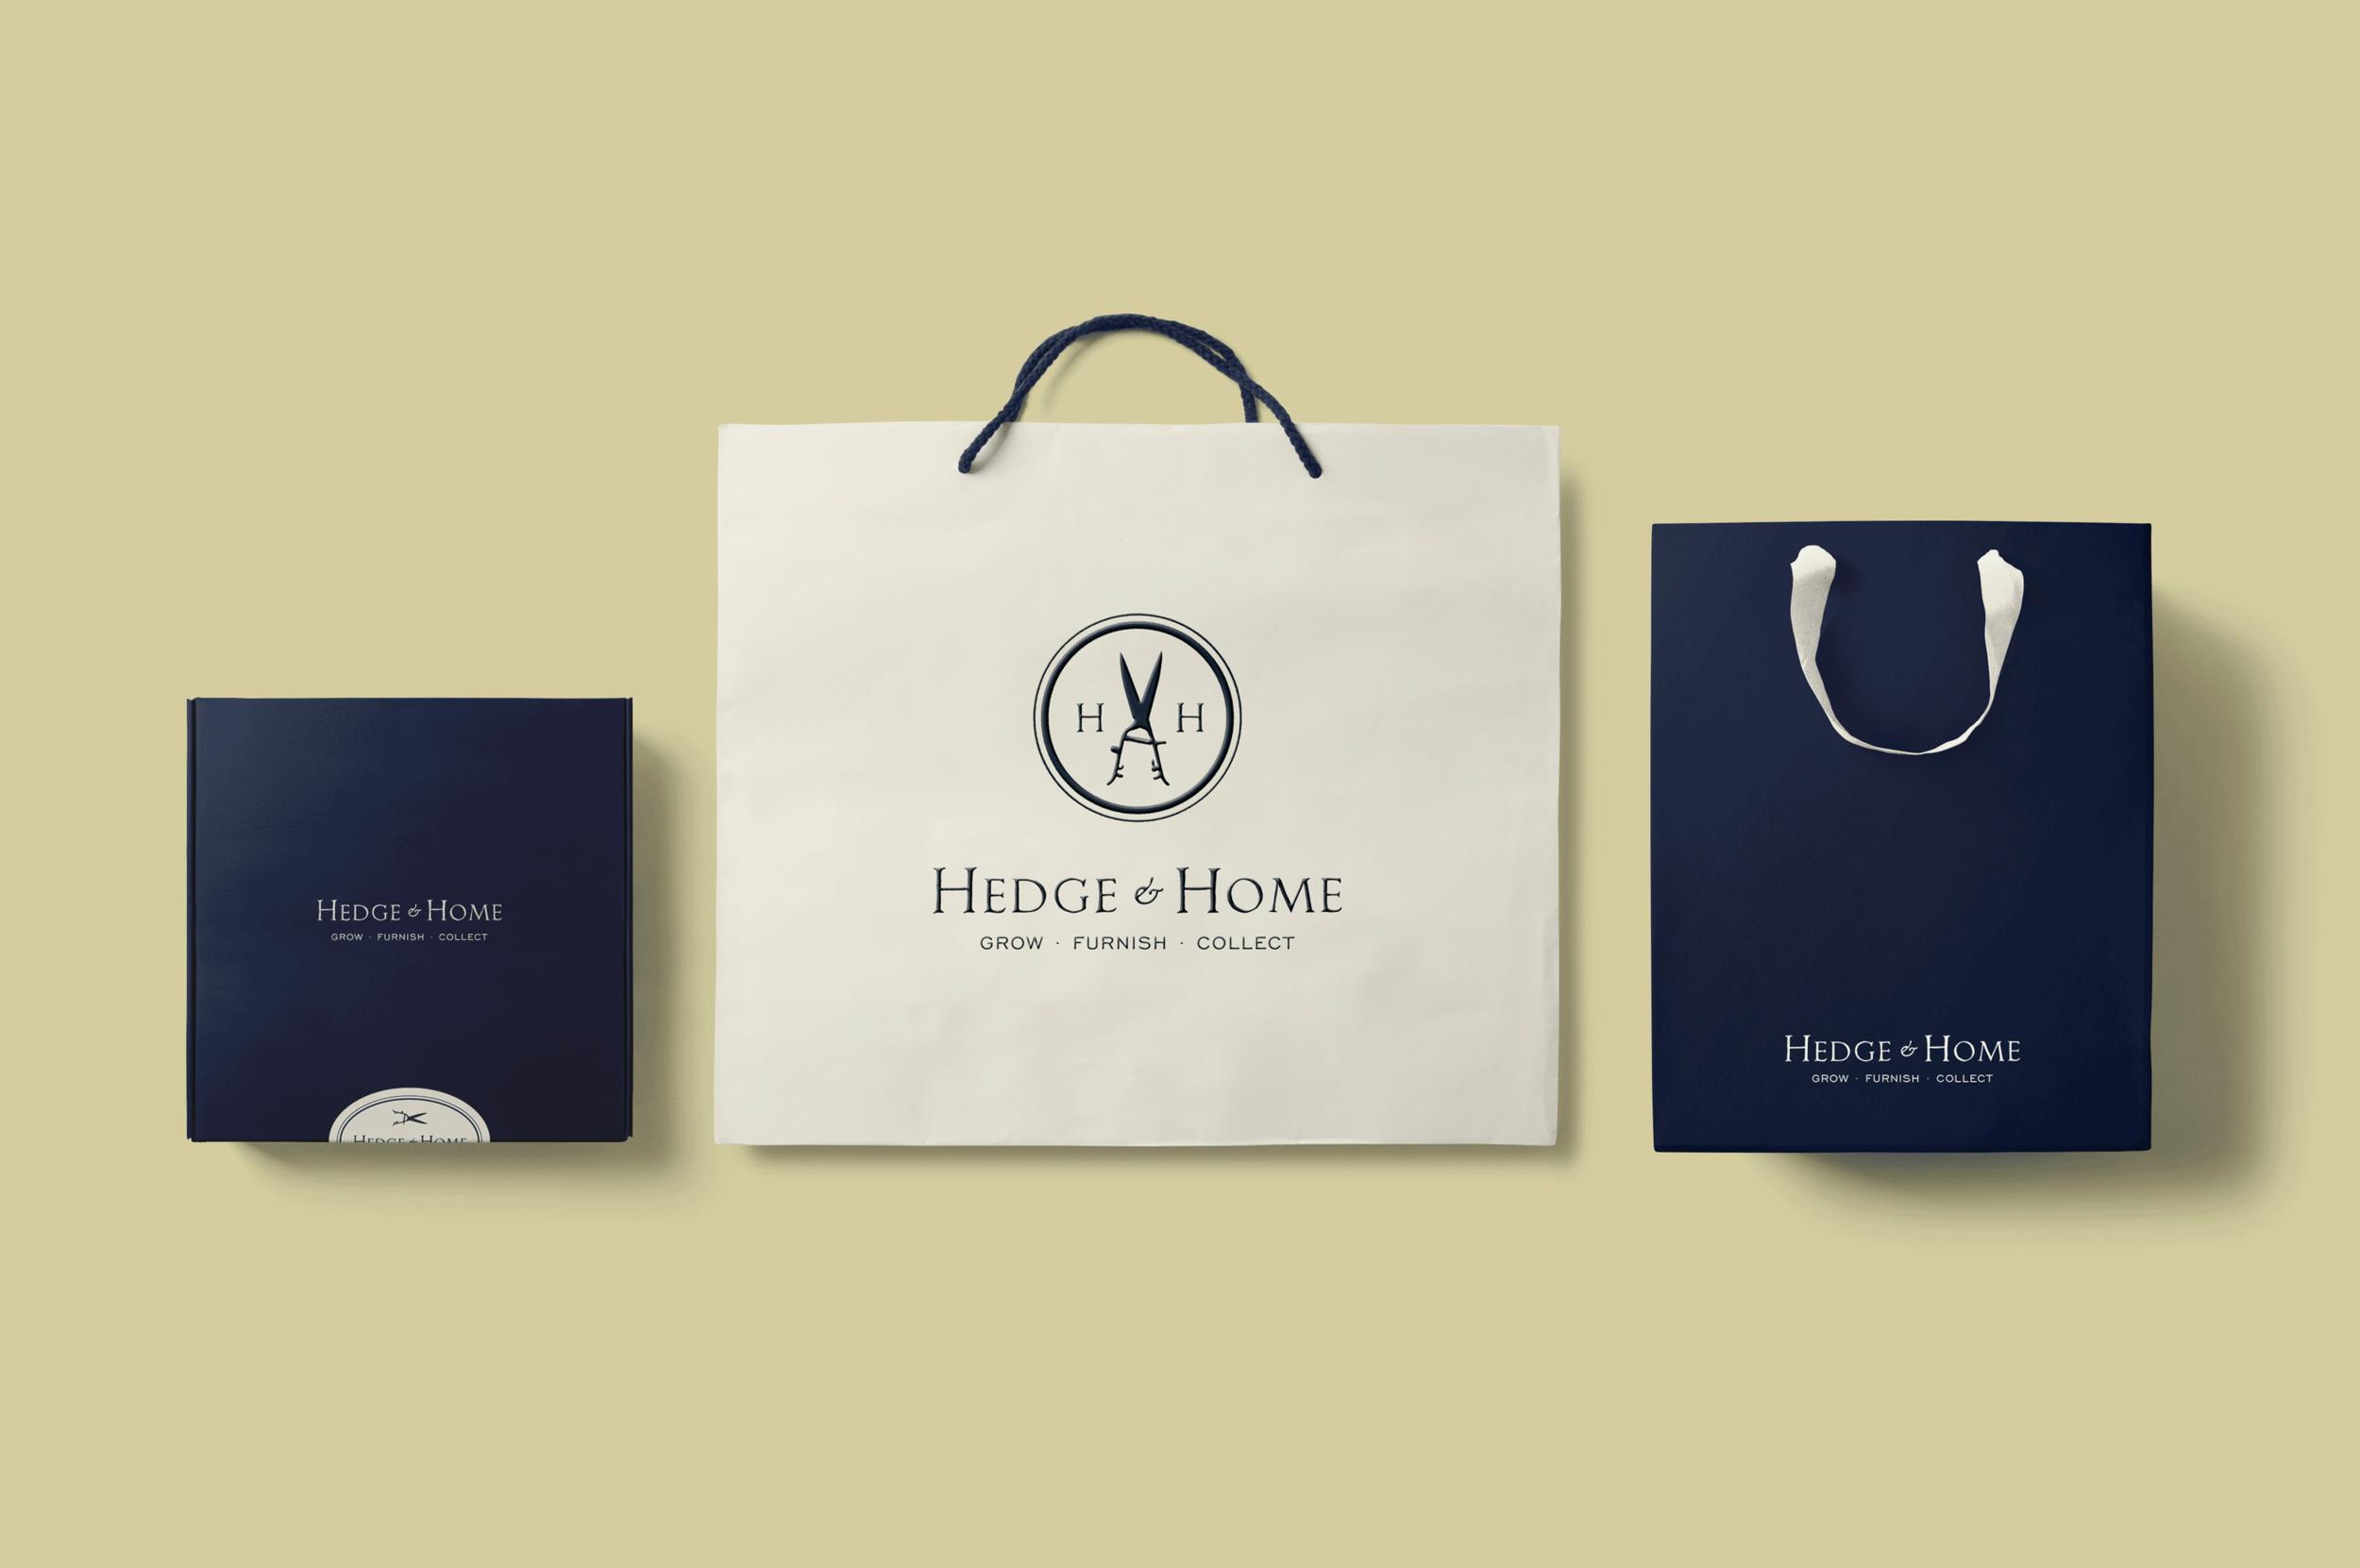 5_Hedge-and-Home_Custom-Bag-Branding-Design_Rachelle-Sartini-Garner.png